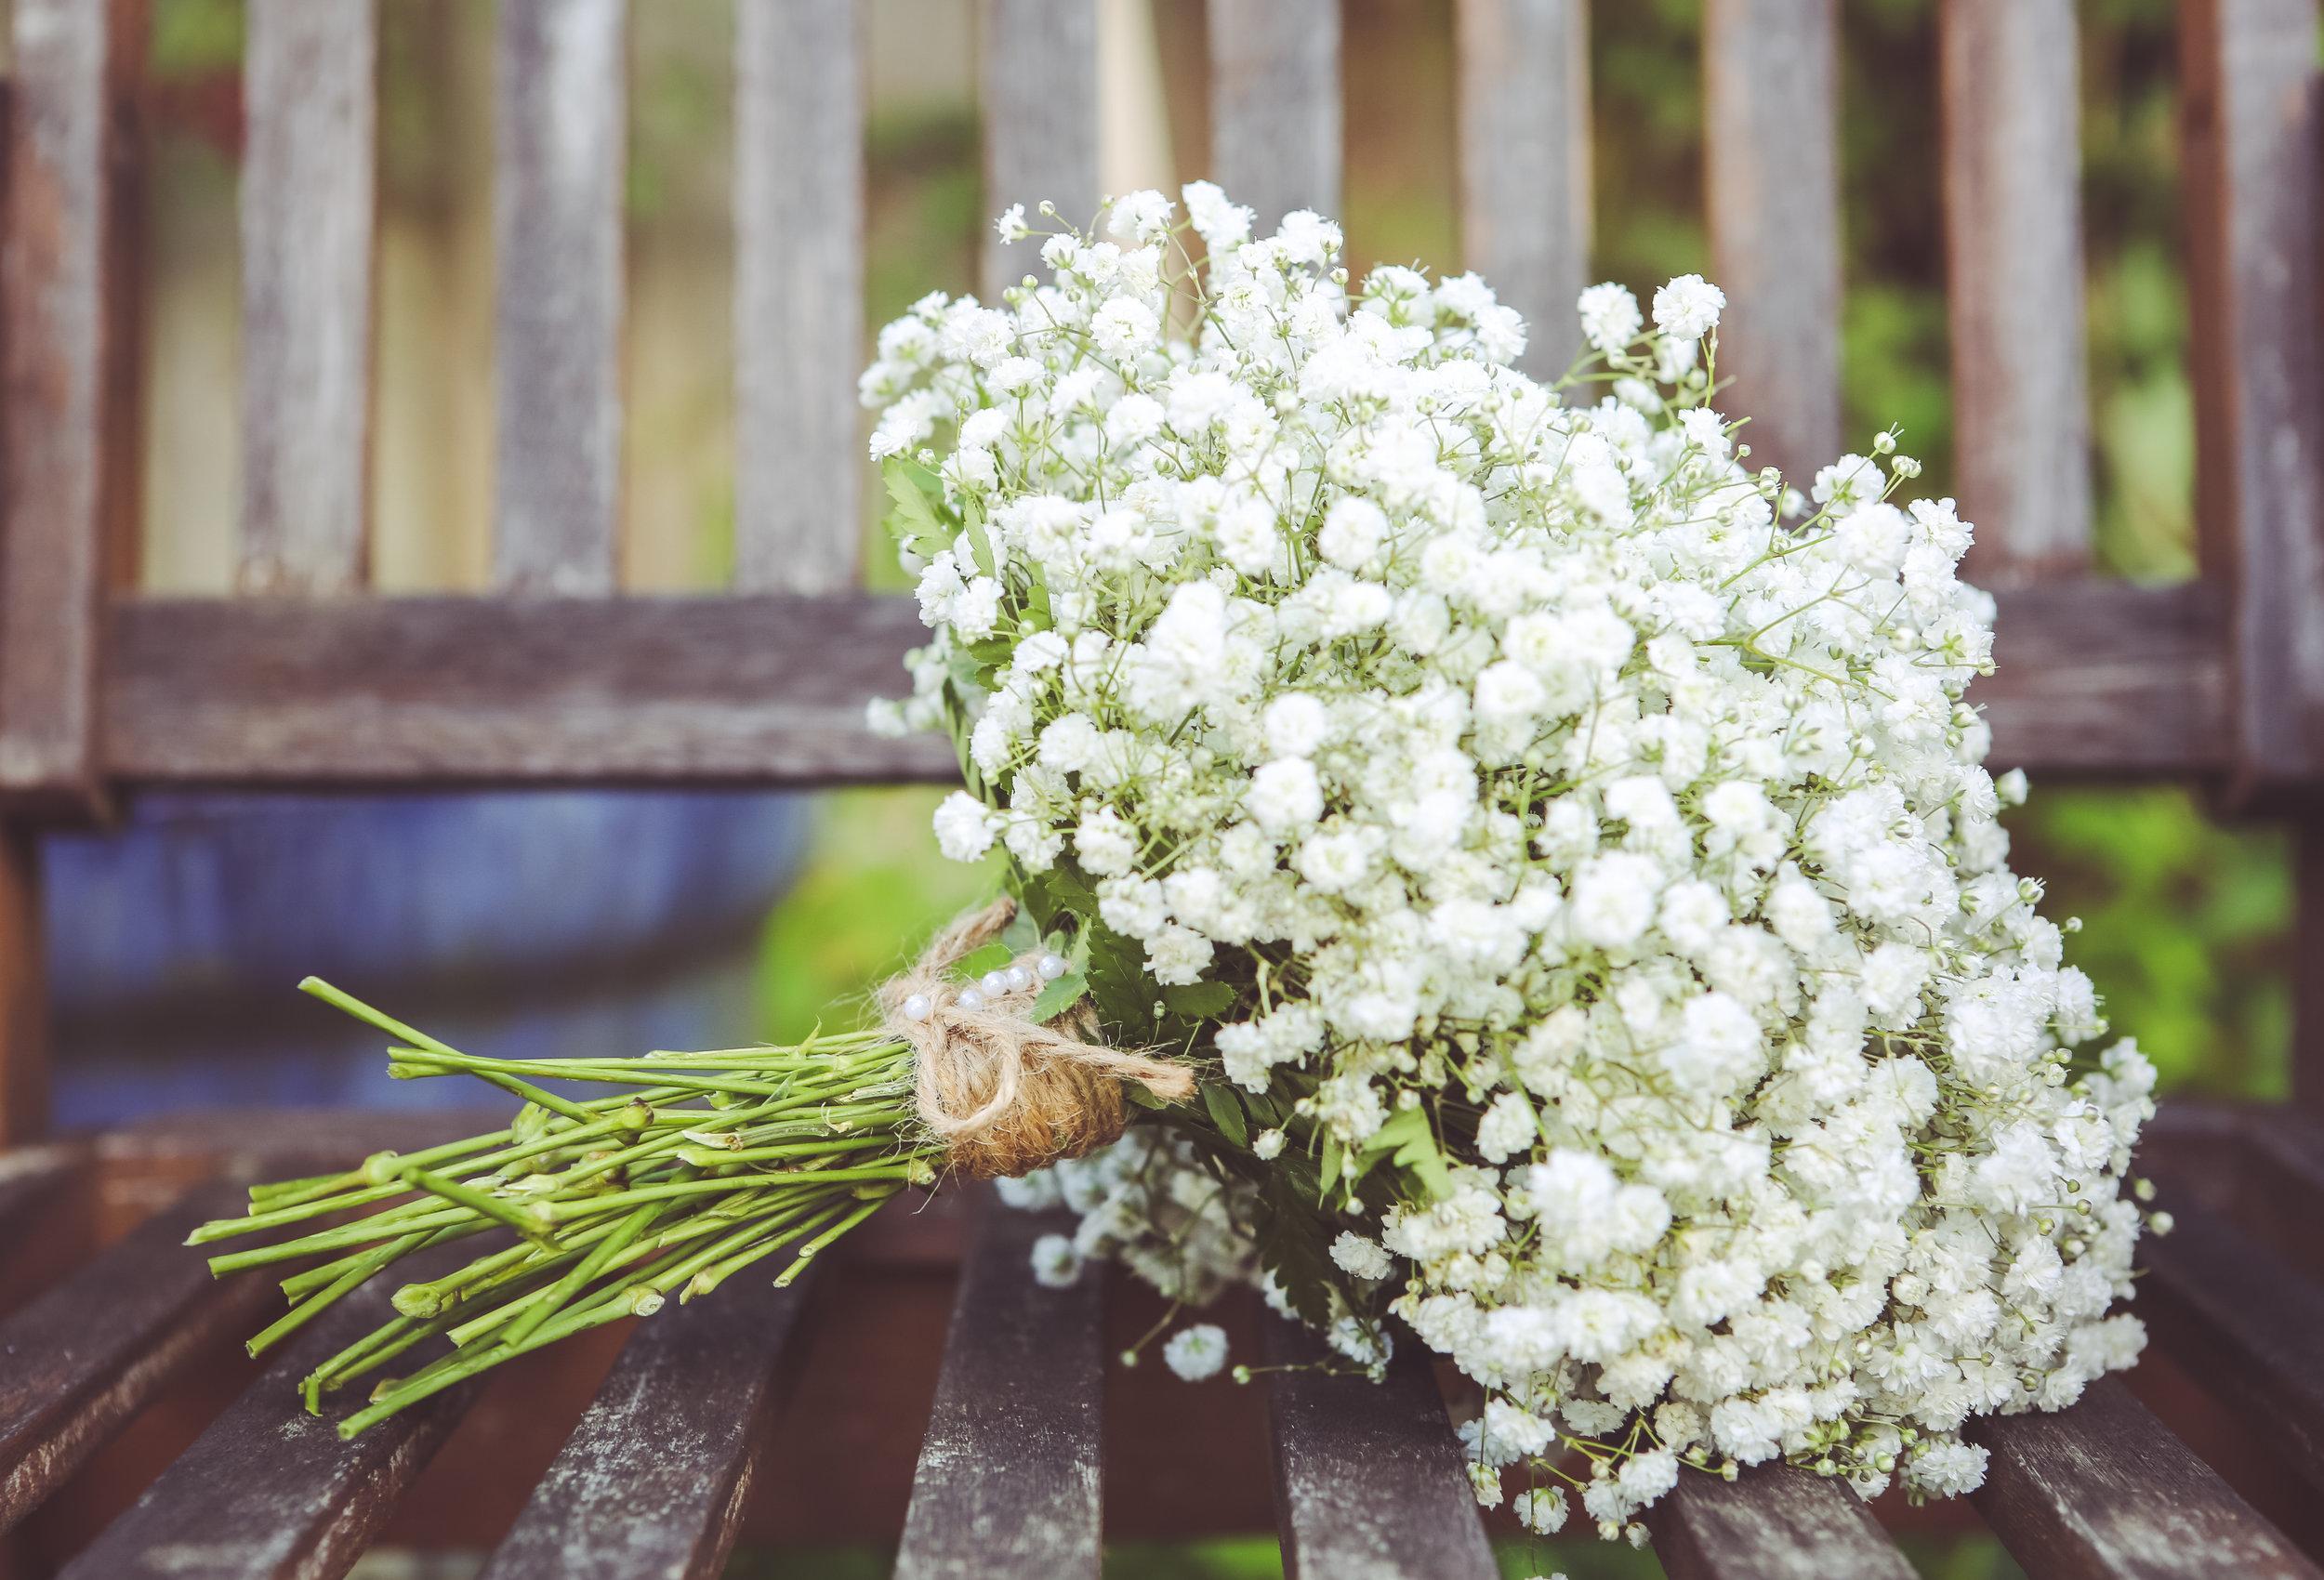 Amy & Adam Wedding - July 2nd 2016 Sussex BarnAmy & Adam Wedding - Sussex BarnFRNH1229 (1).jpg